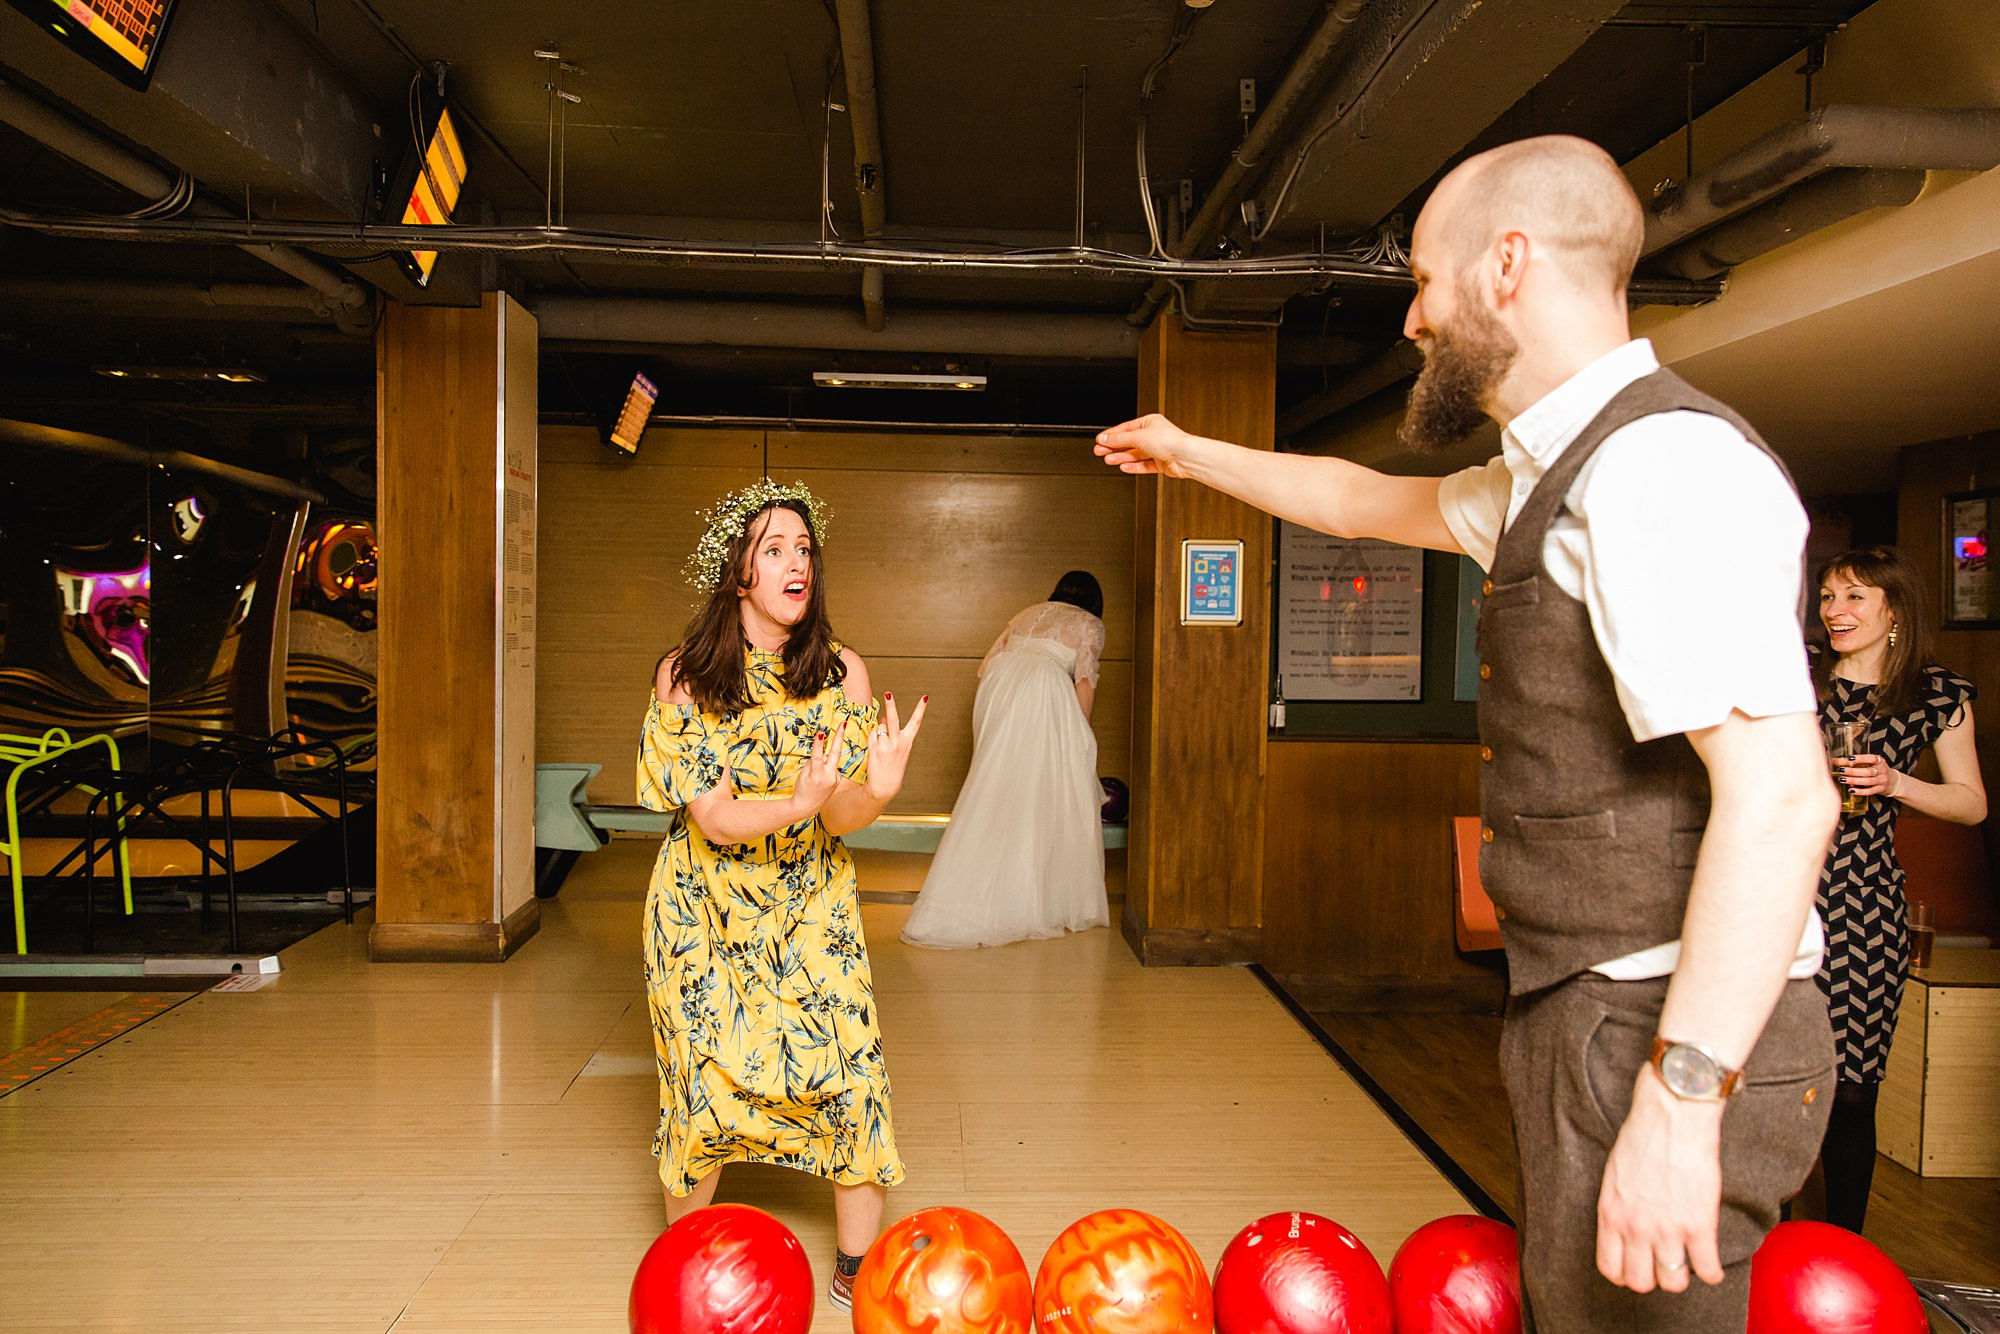 fun london wedding bowling guests cheer during bowling